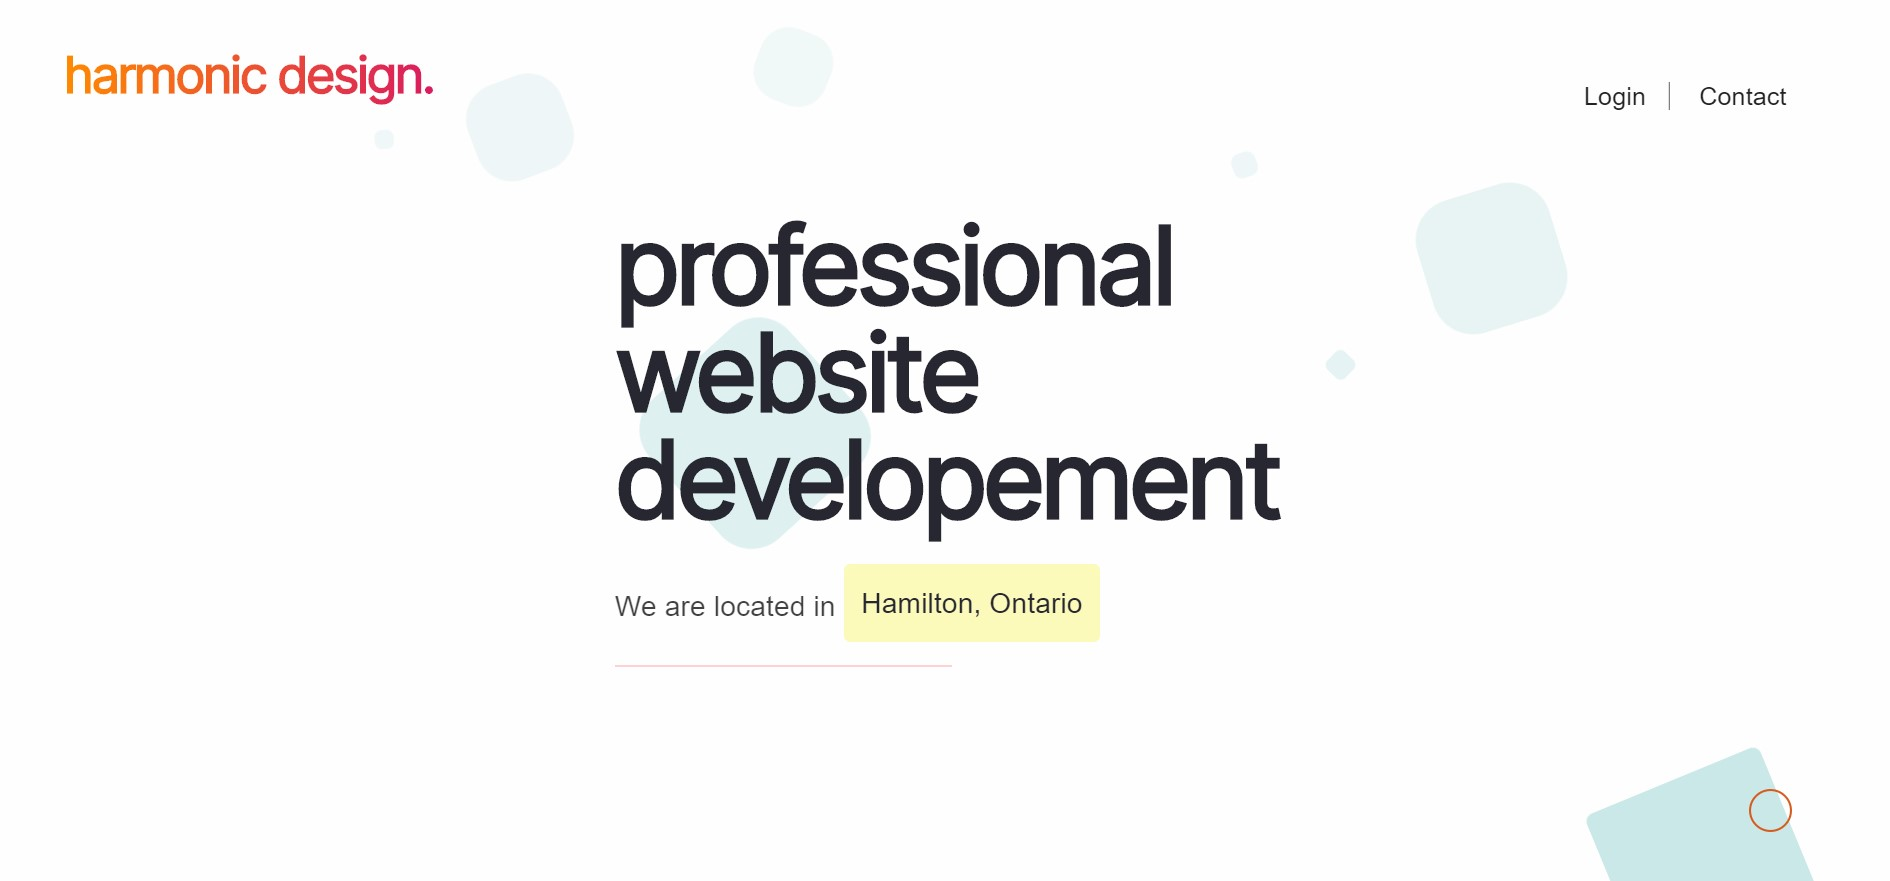 harmonic design web developer in hamilton